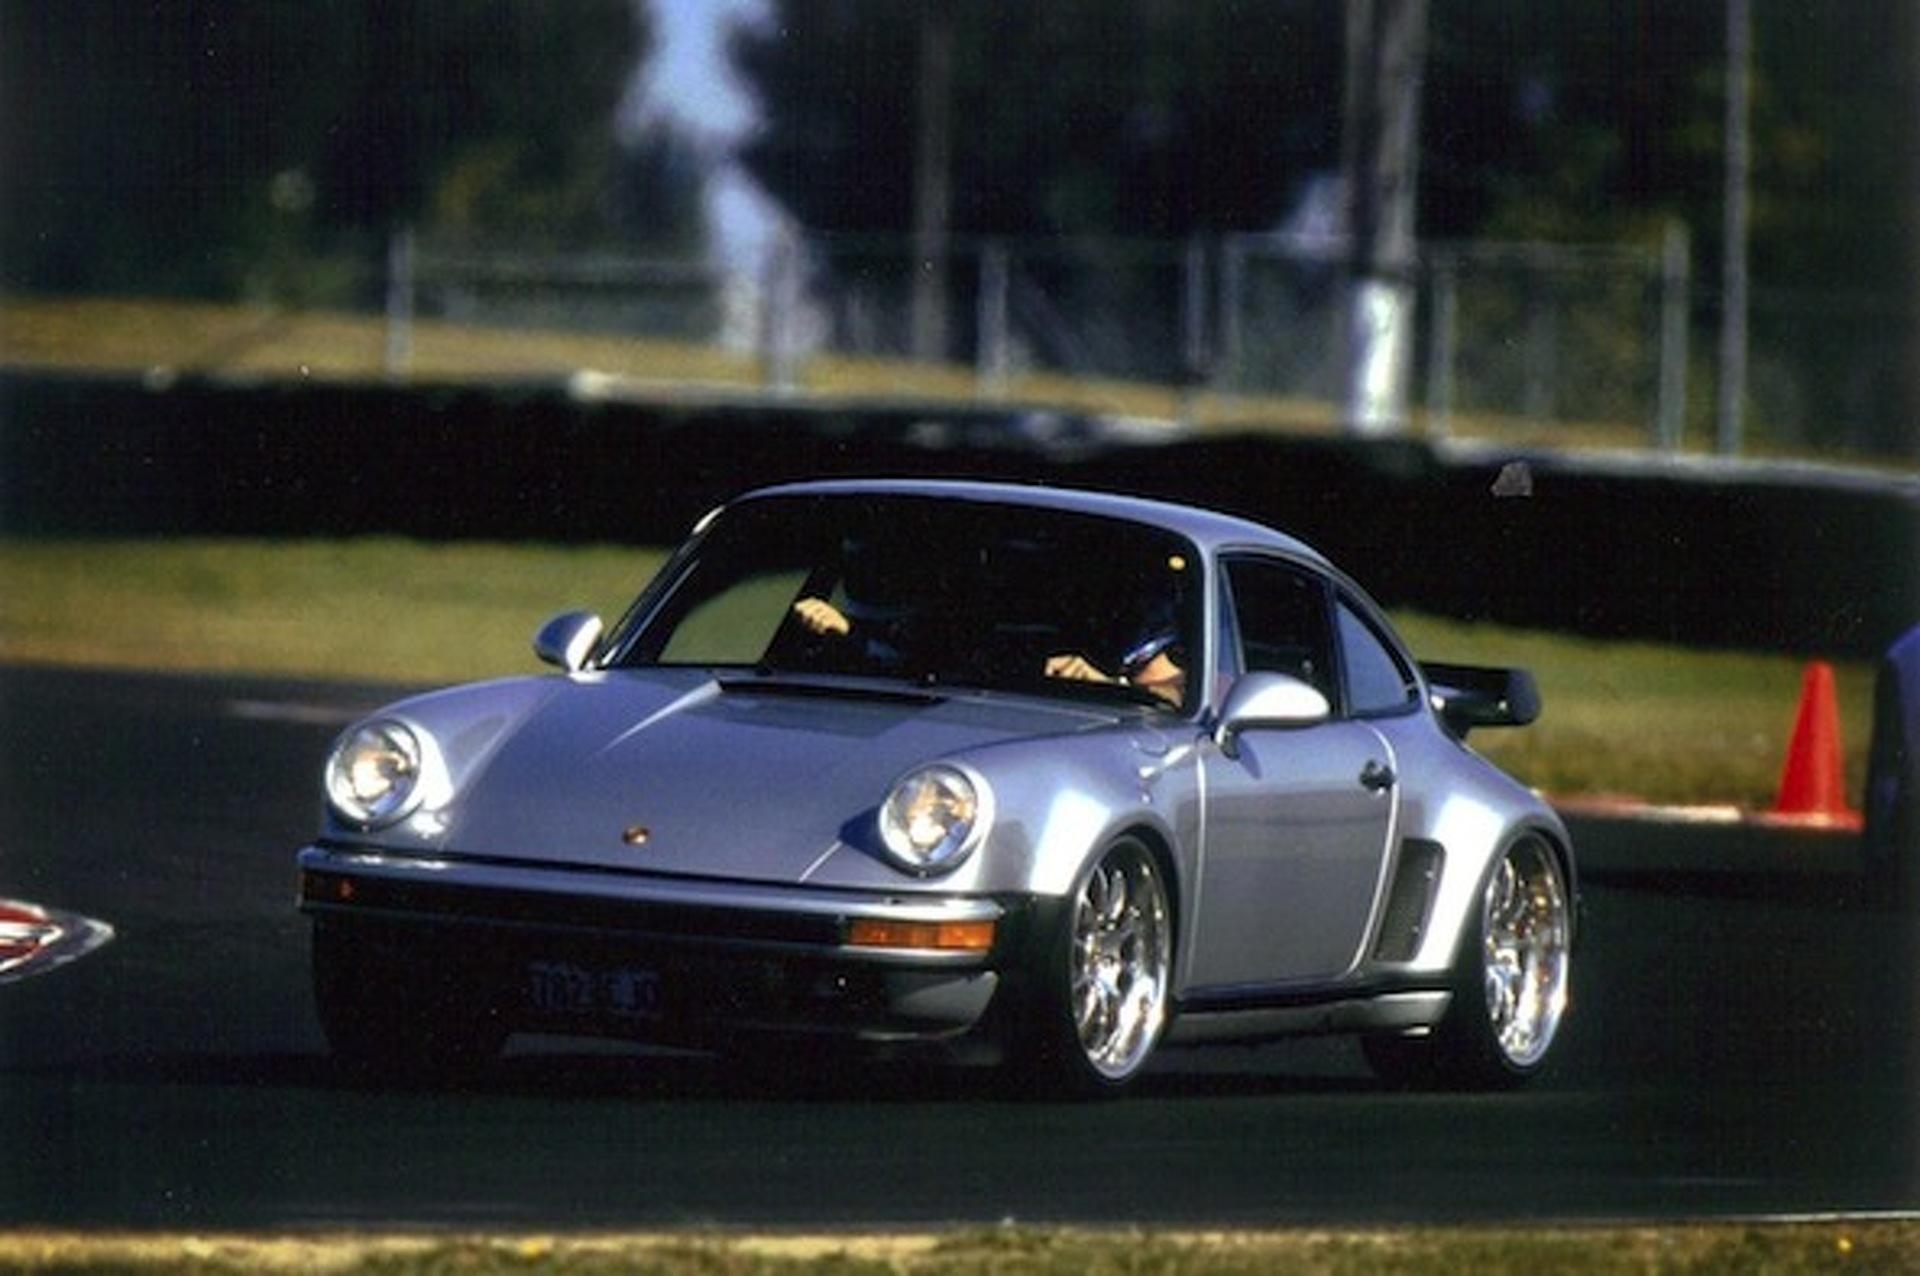 Your Ride: 1986 Porsche 911 Turbo